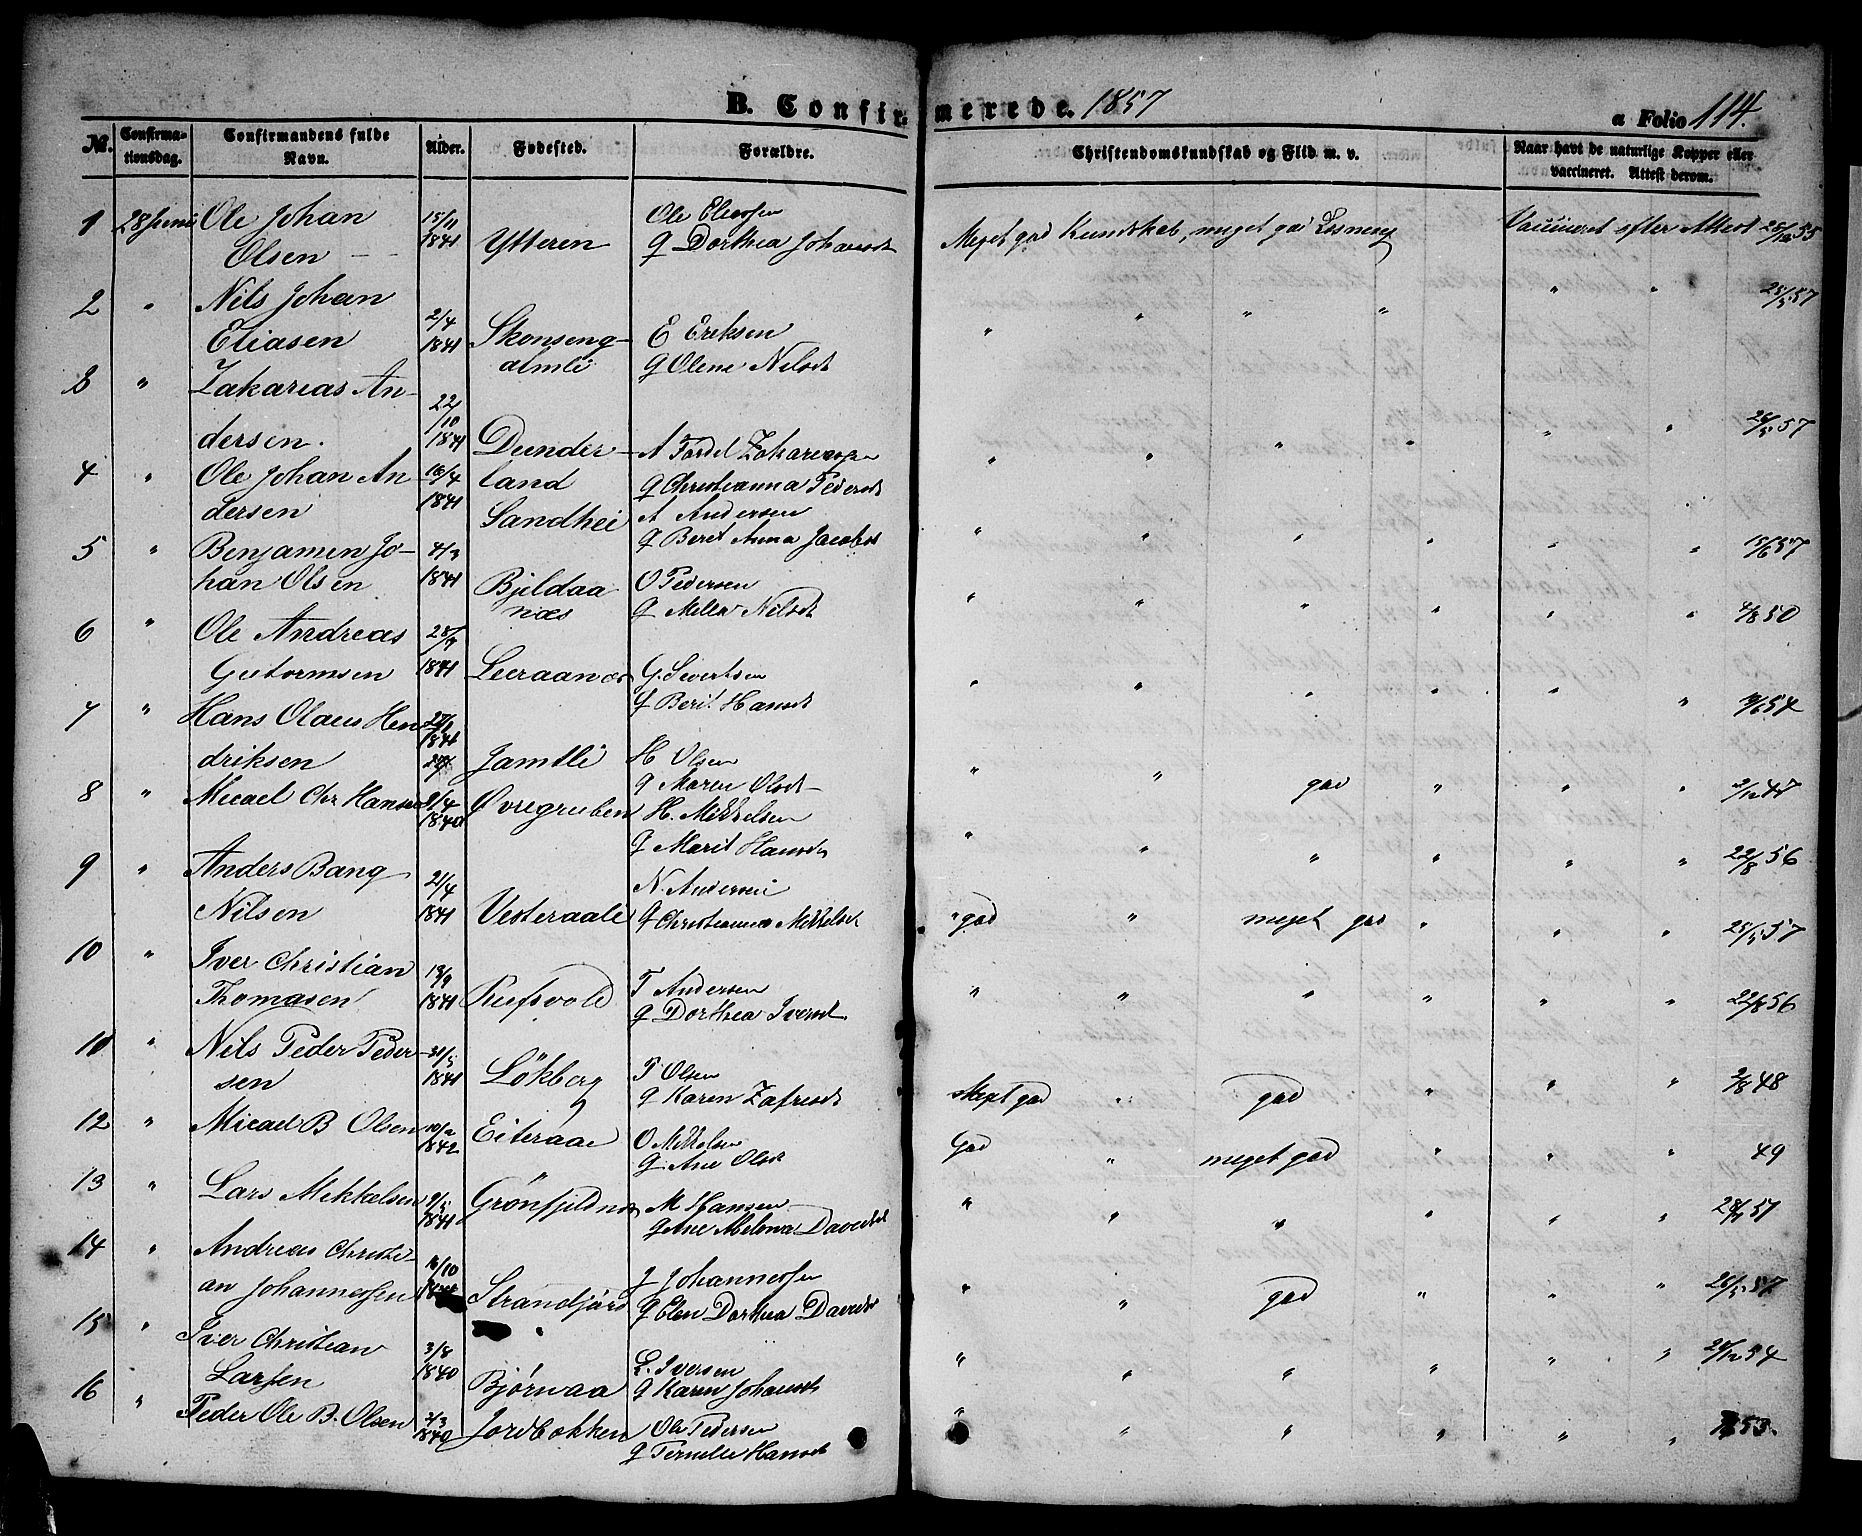 SAT, Ministerialprotokoller, klokkerbøker og fødselsregistre - Nordland, 827/L0414: Klokkerbok nr. 827C03, 1853-1865, s. 114